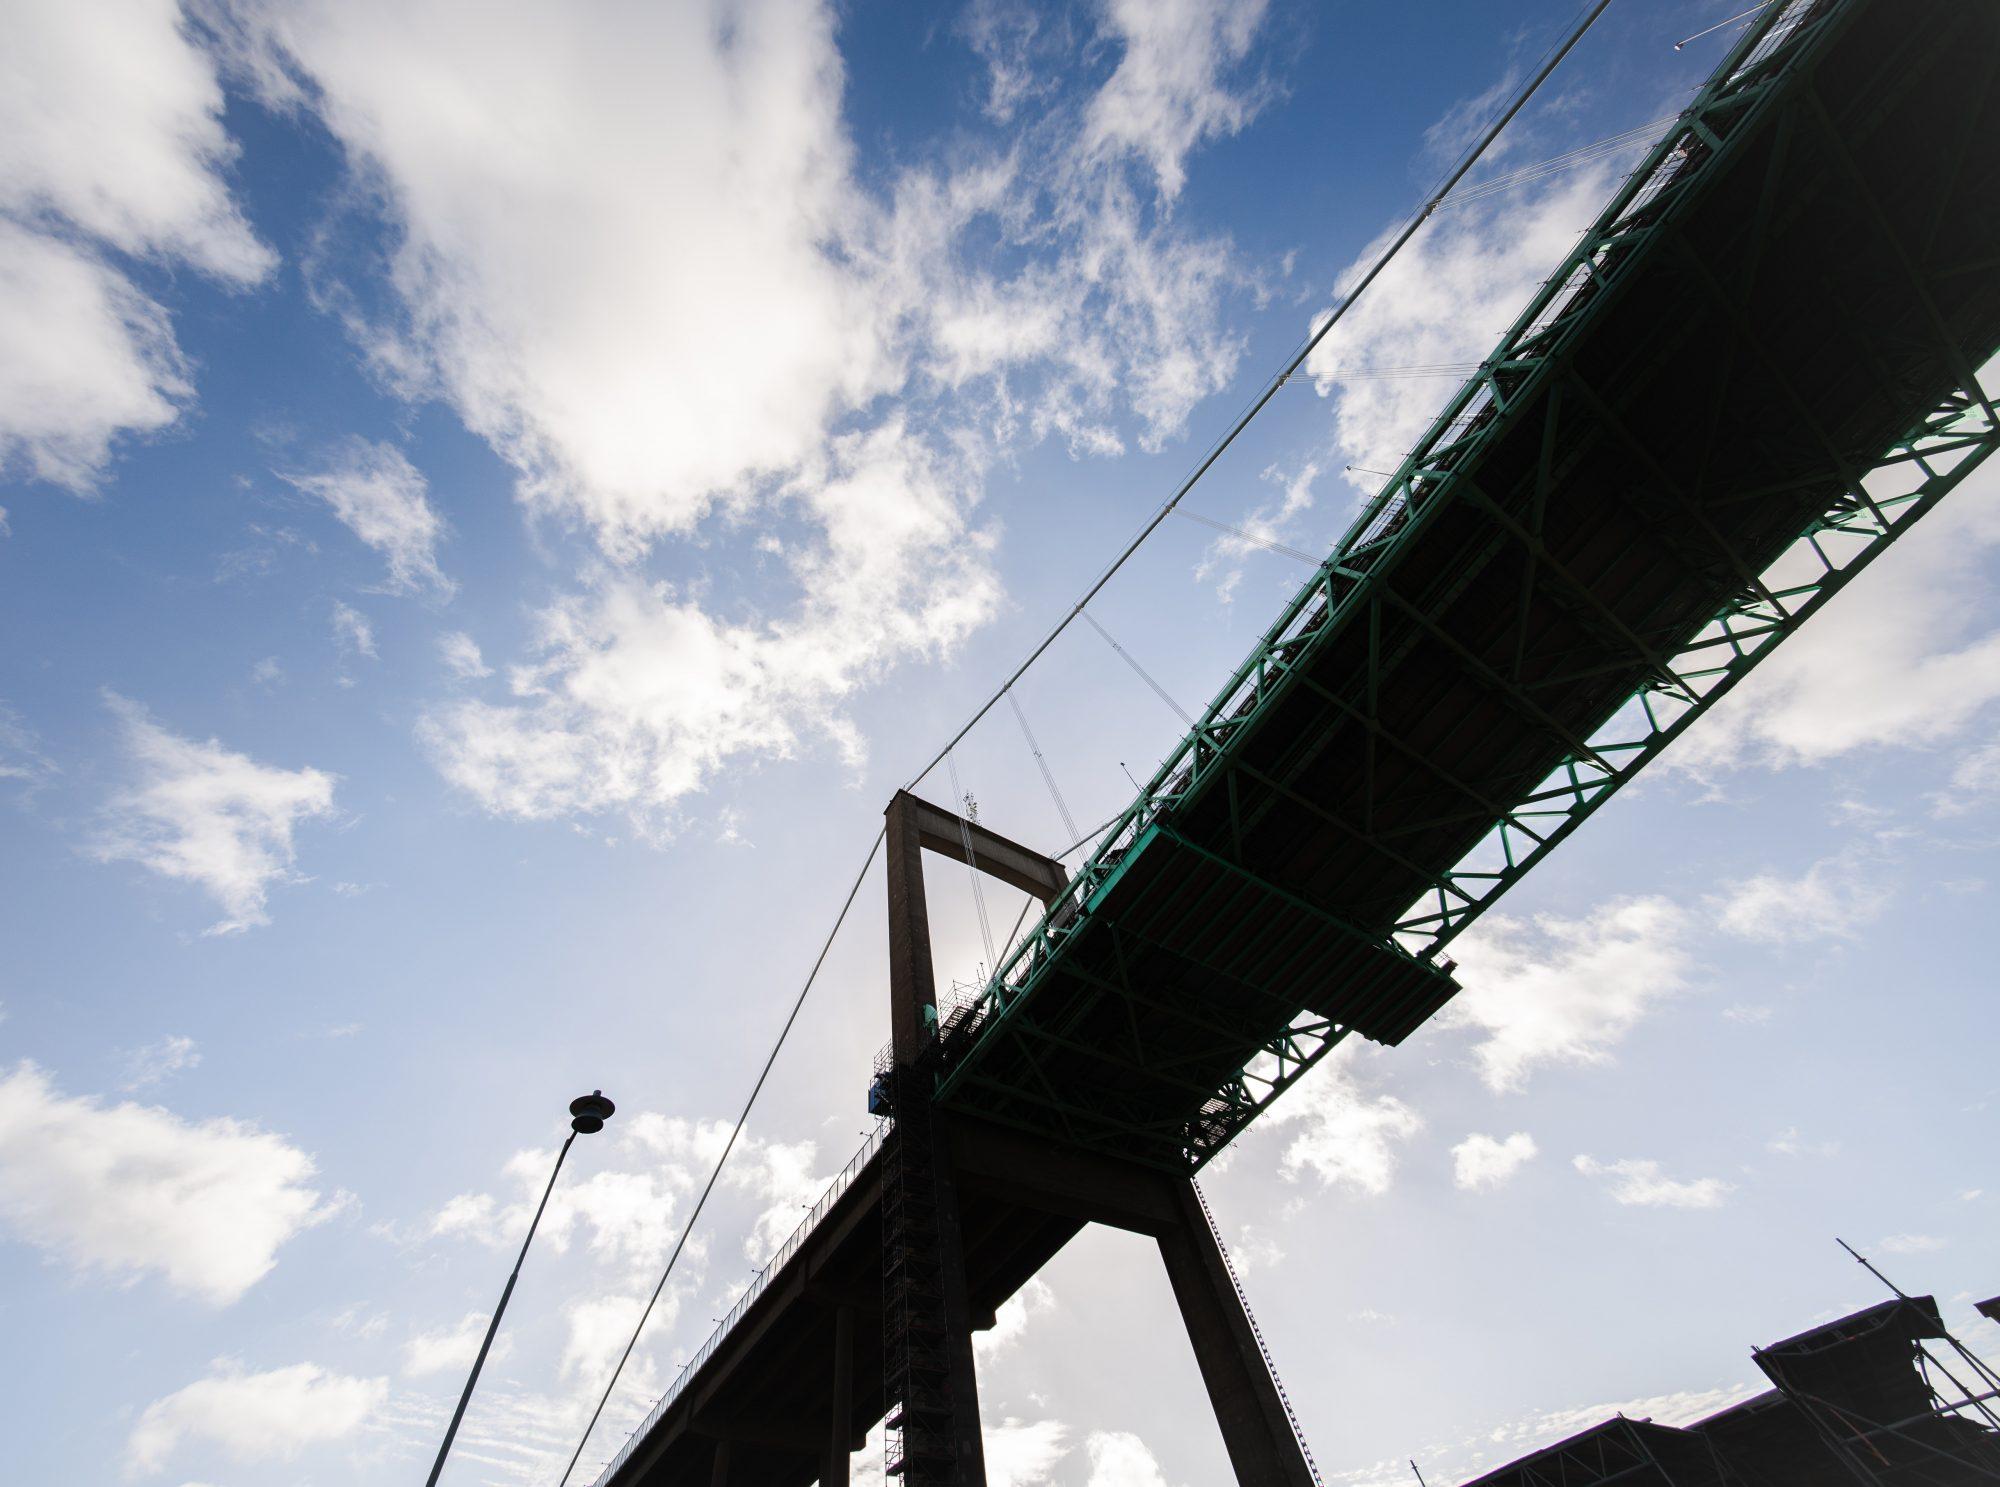 Bro med blå himmel